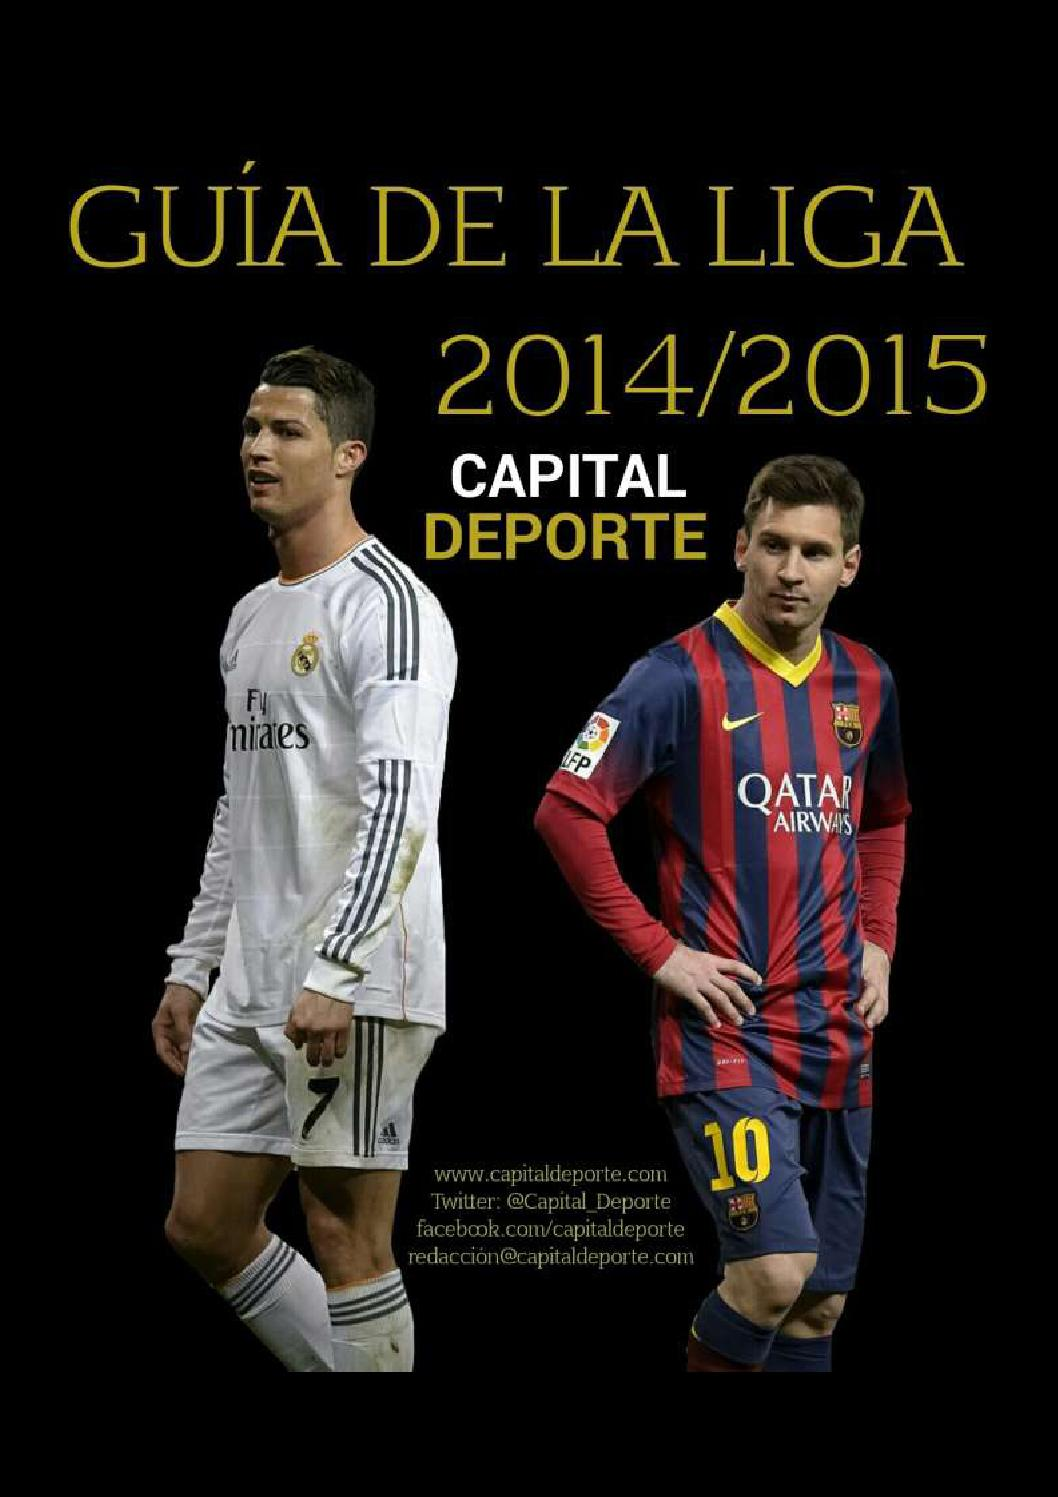 Guia de la Liga 2014 2015 de Capital Deporte by Capital Deporte - issuu b402ab5c09e18